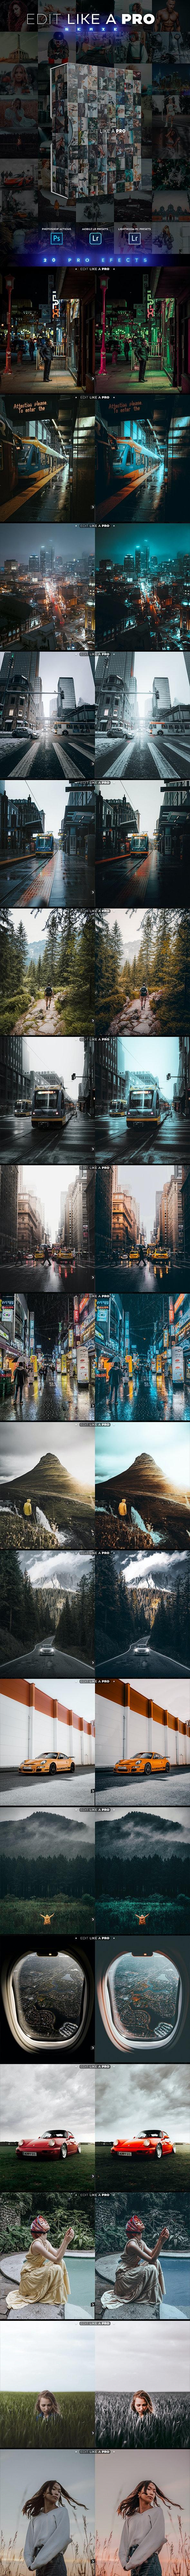 Edit Edit Like A Pro Serie II - Photoshop & Lightroom Effects - Lightroom Presets Add-ons